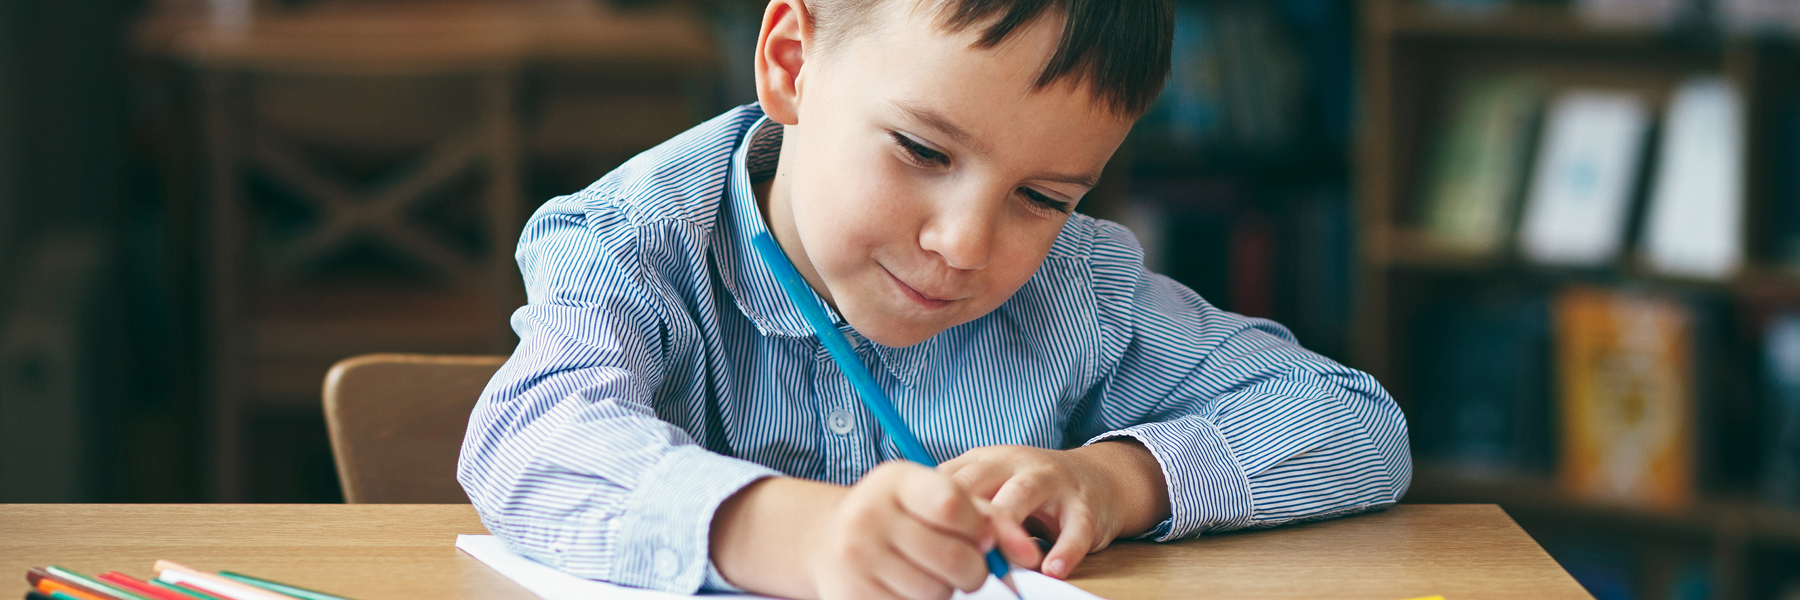 kids practice math problem